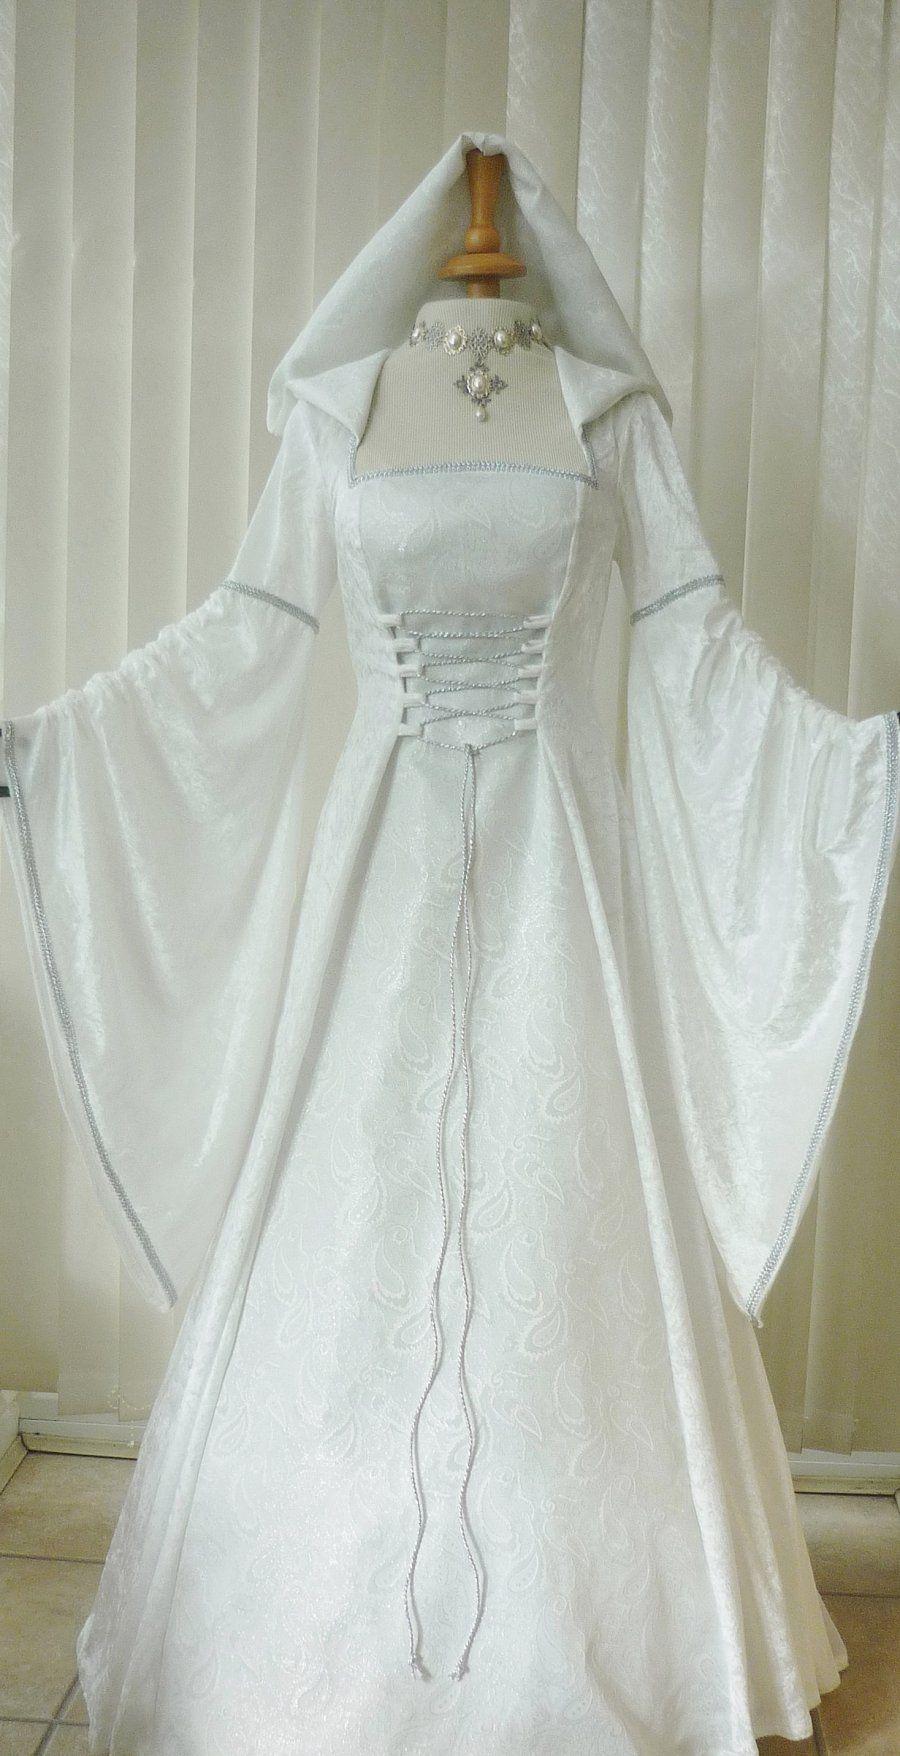 Medieval Pagan Renaissance Ivory & Silver Hooded Wedding Dress